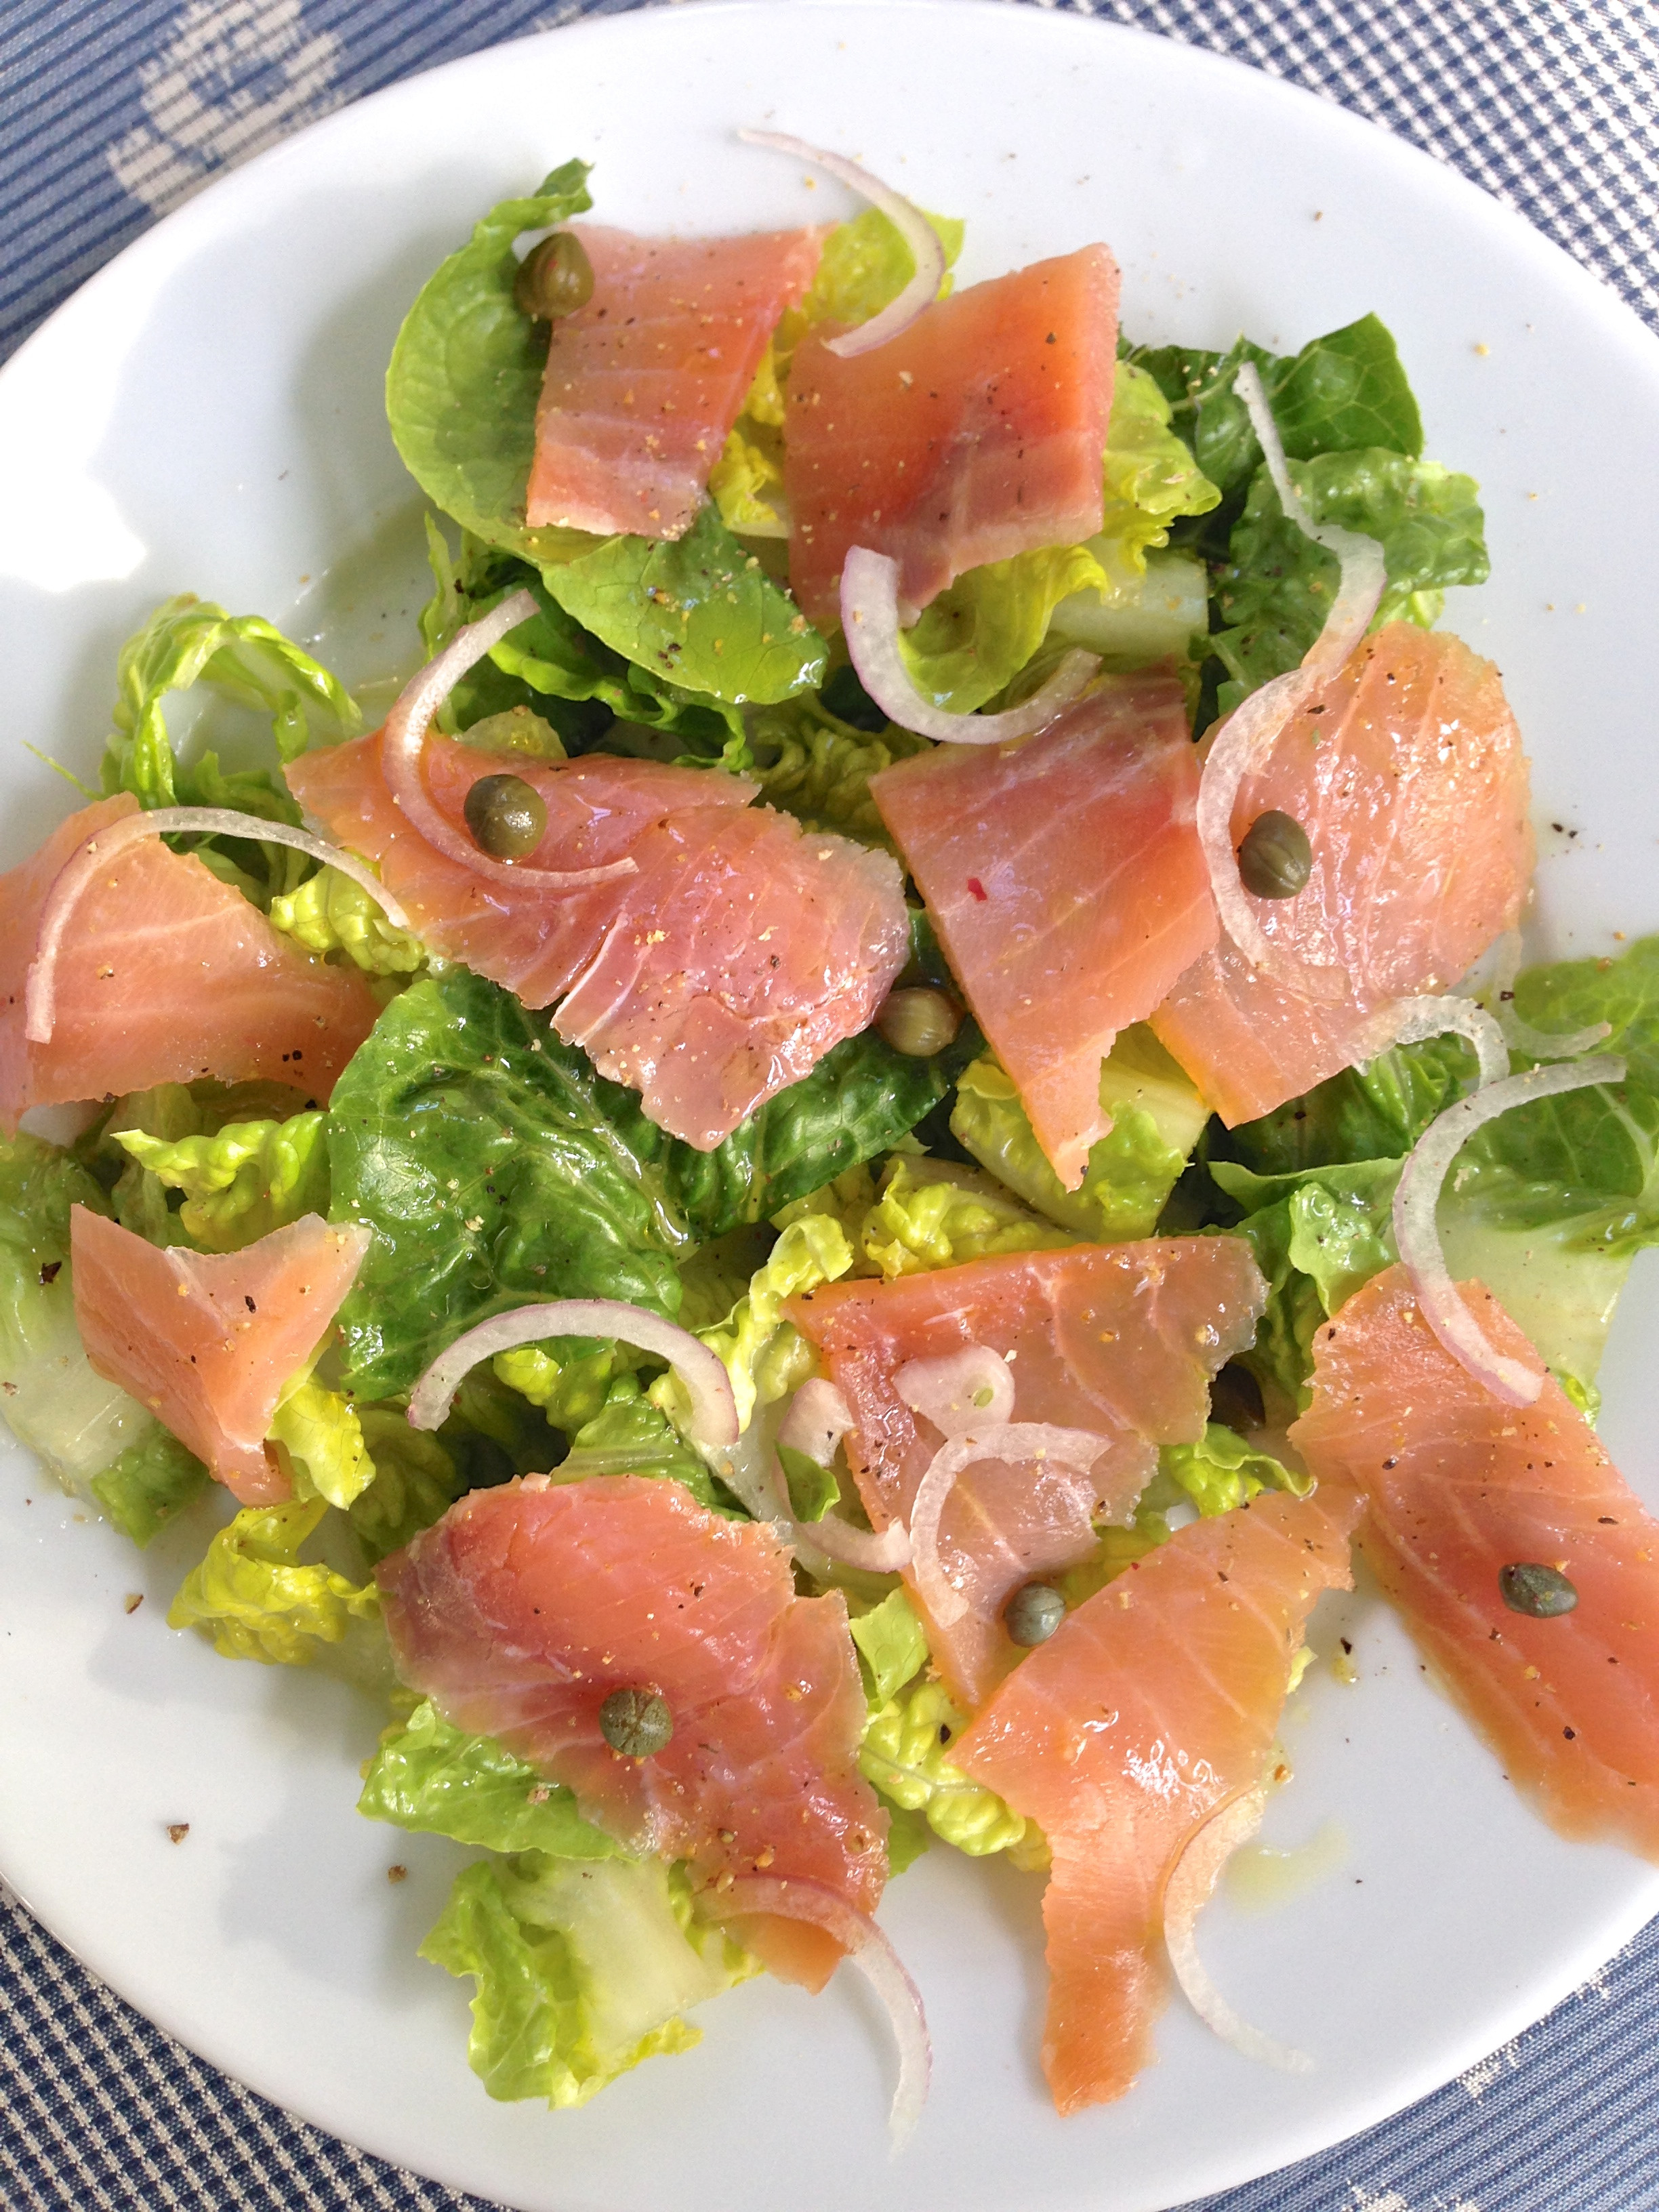 Salad With Salmon  Romaine Salad with Smoked Salmon Laughter and Lemonade